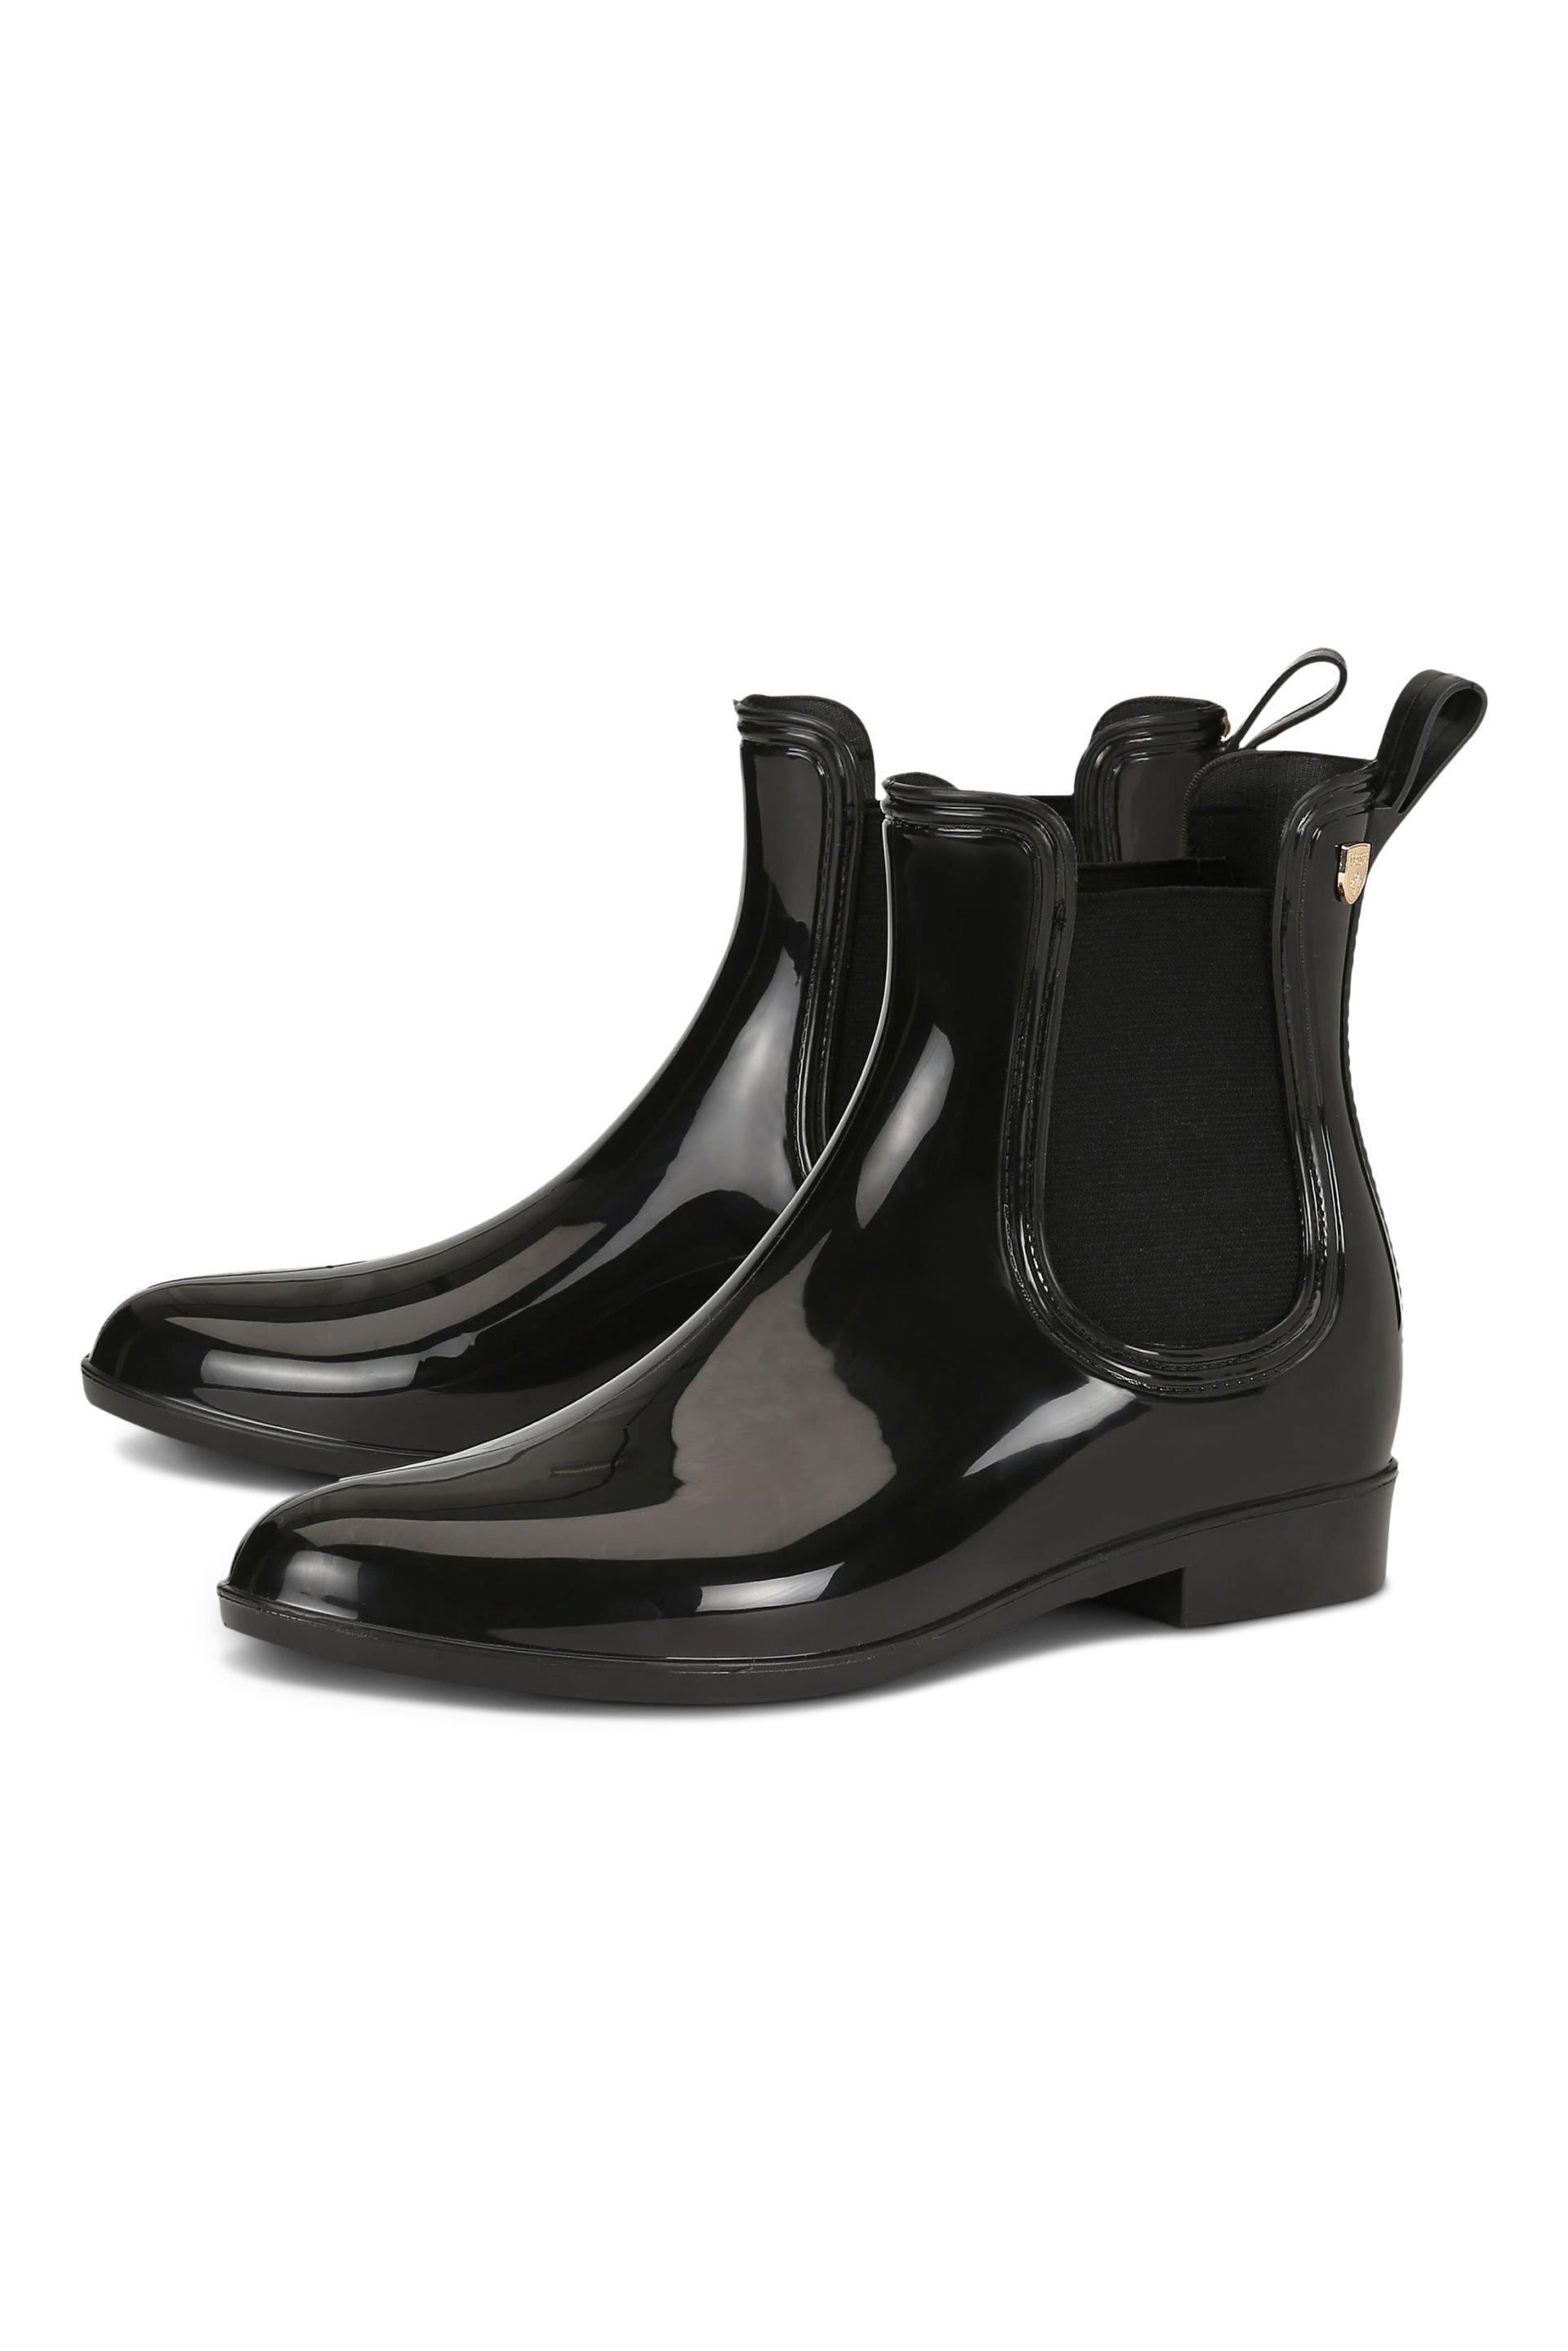 Chelsea rainboots in shiny black